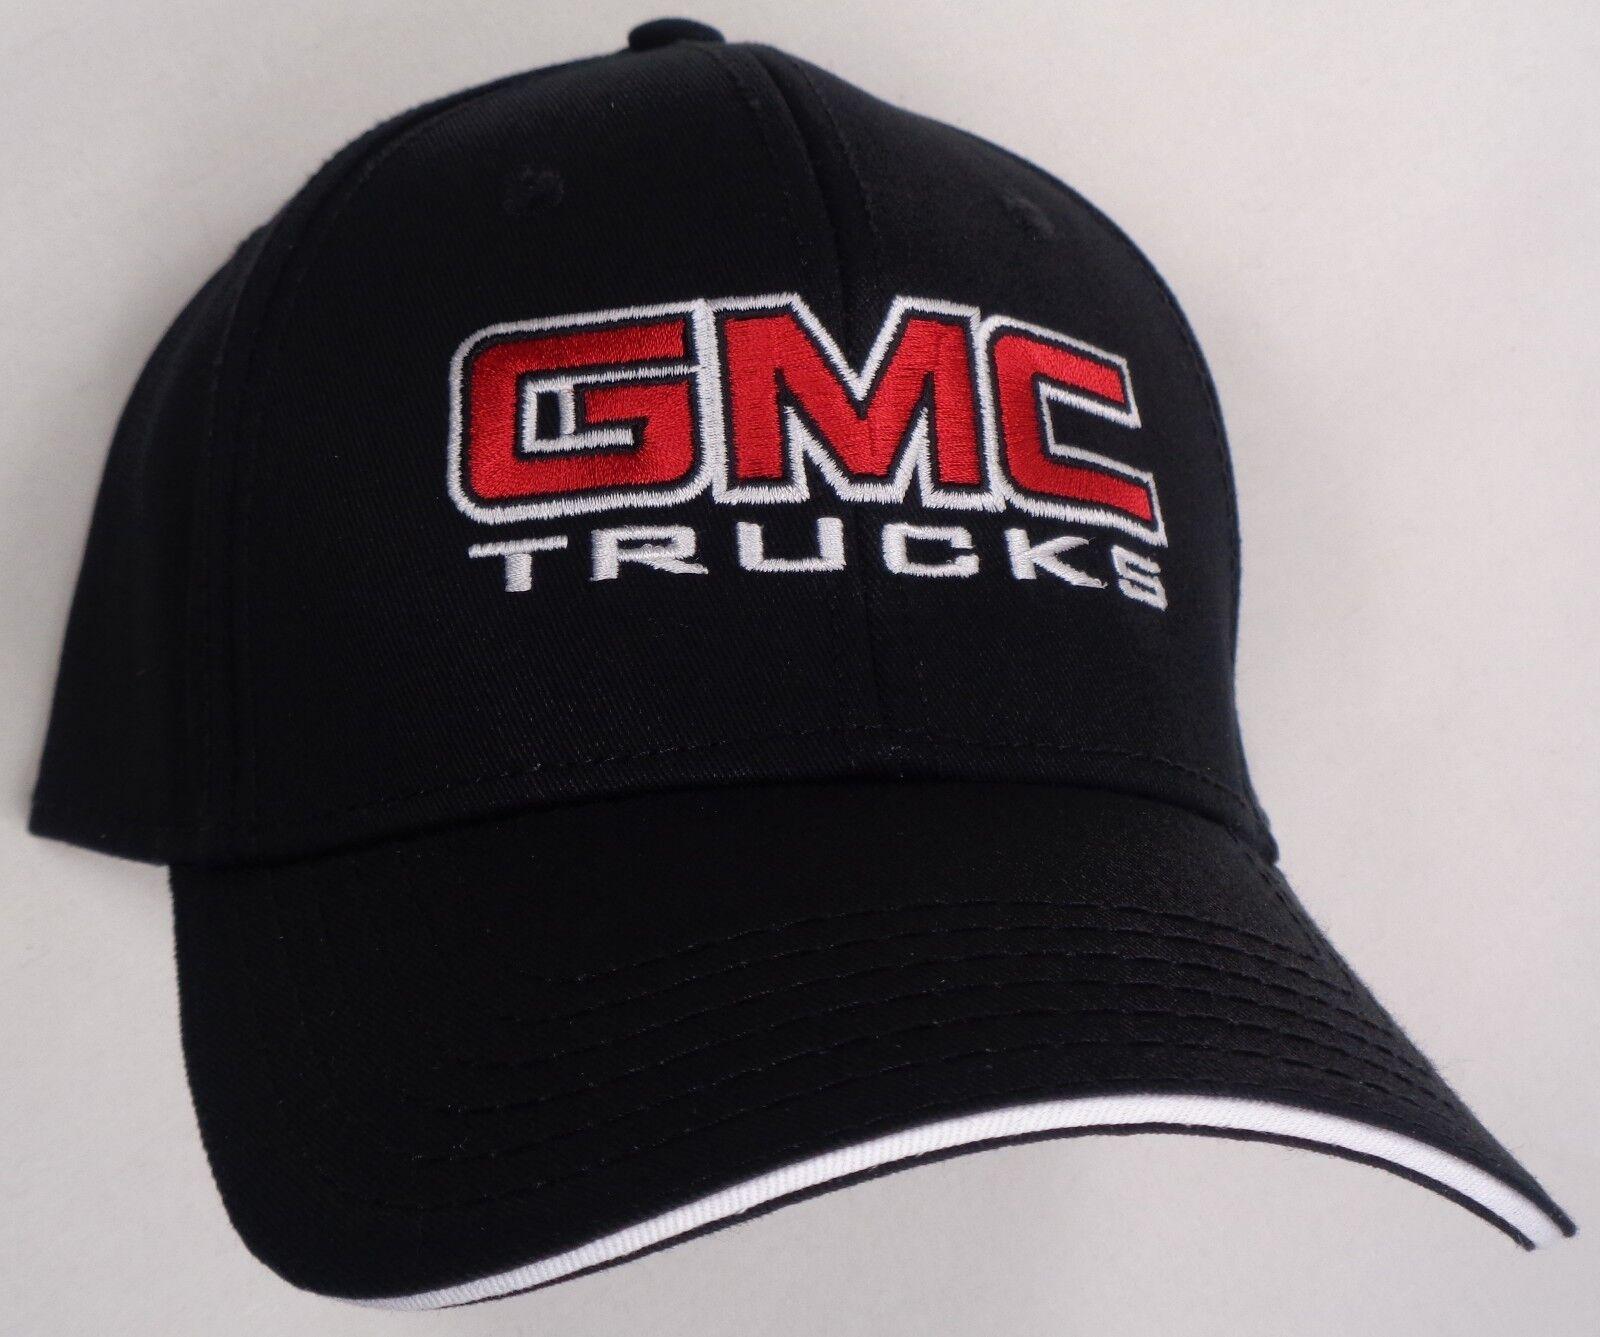 Hat Cap Licensed GMC Truck Trucks Black HR 201